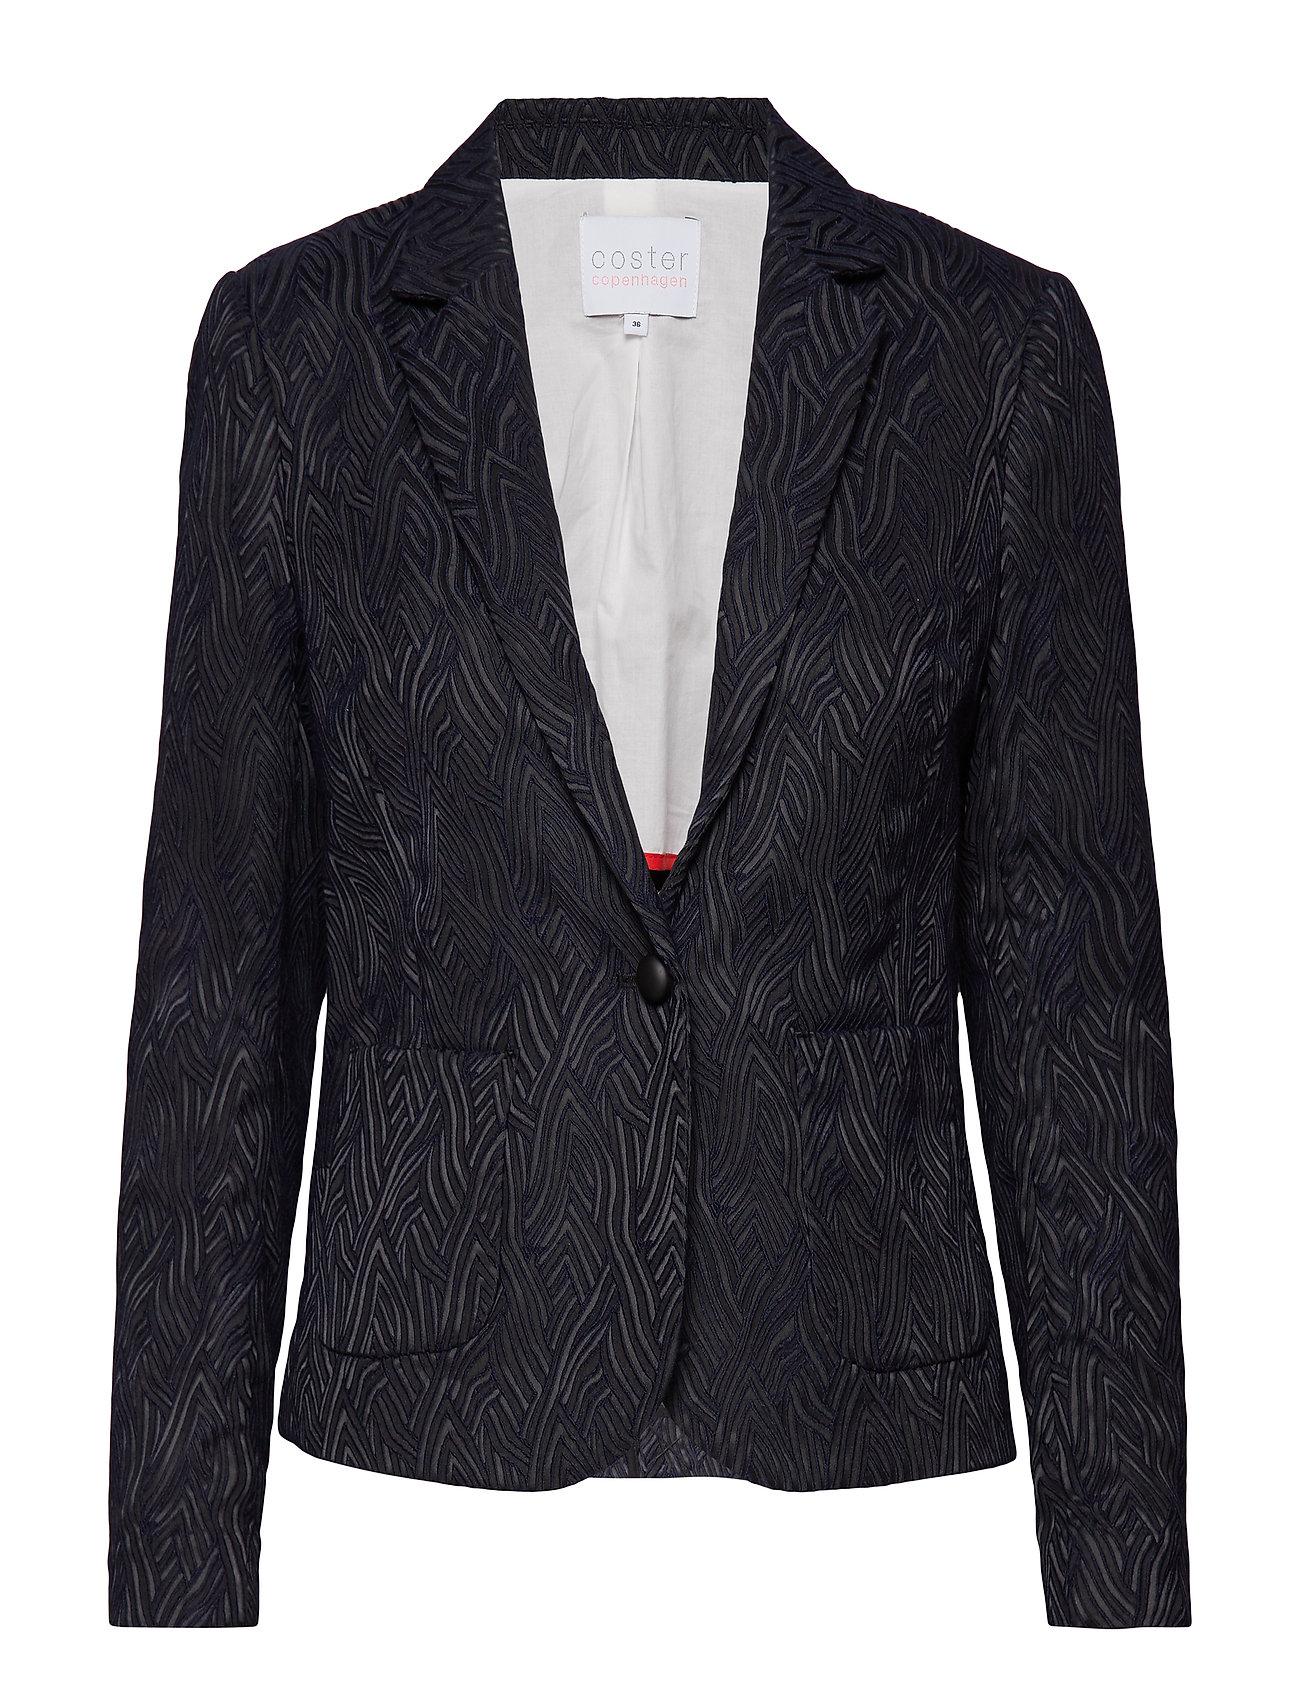 Coster Copenhagen Jacket in wave jacquard stretch w. - BLACK